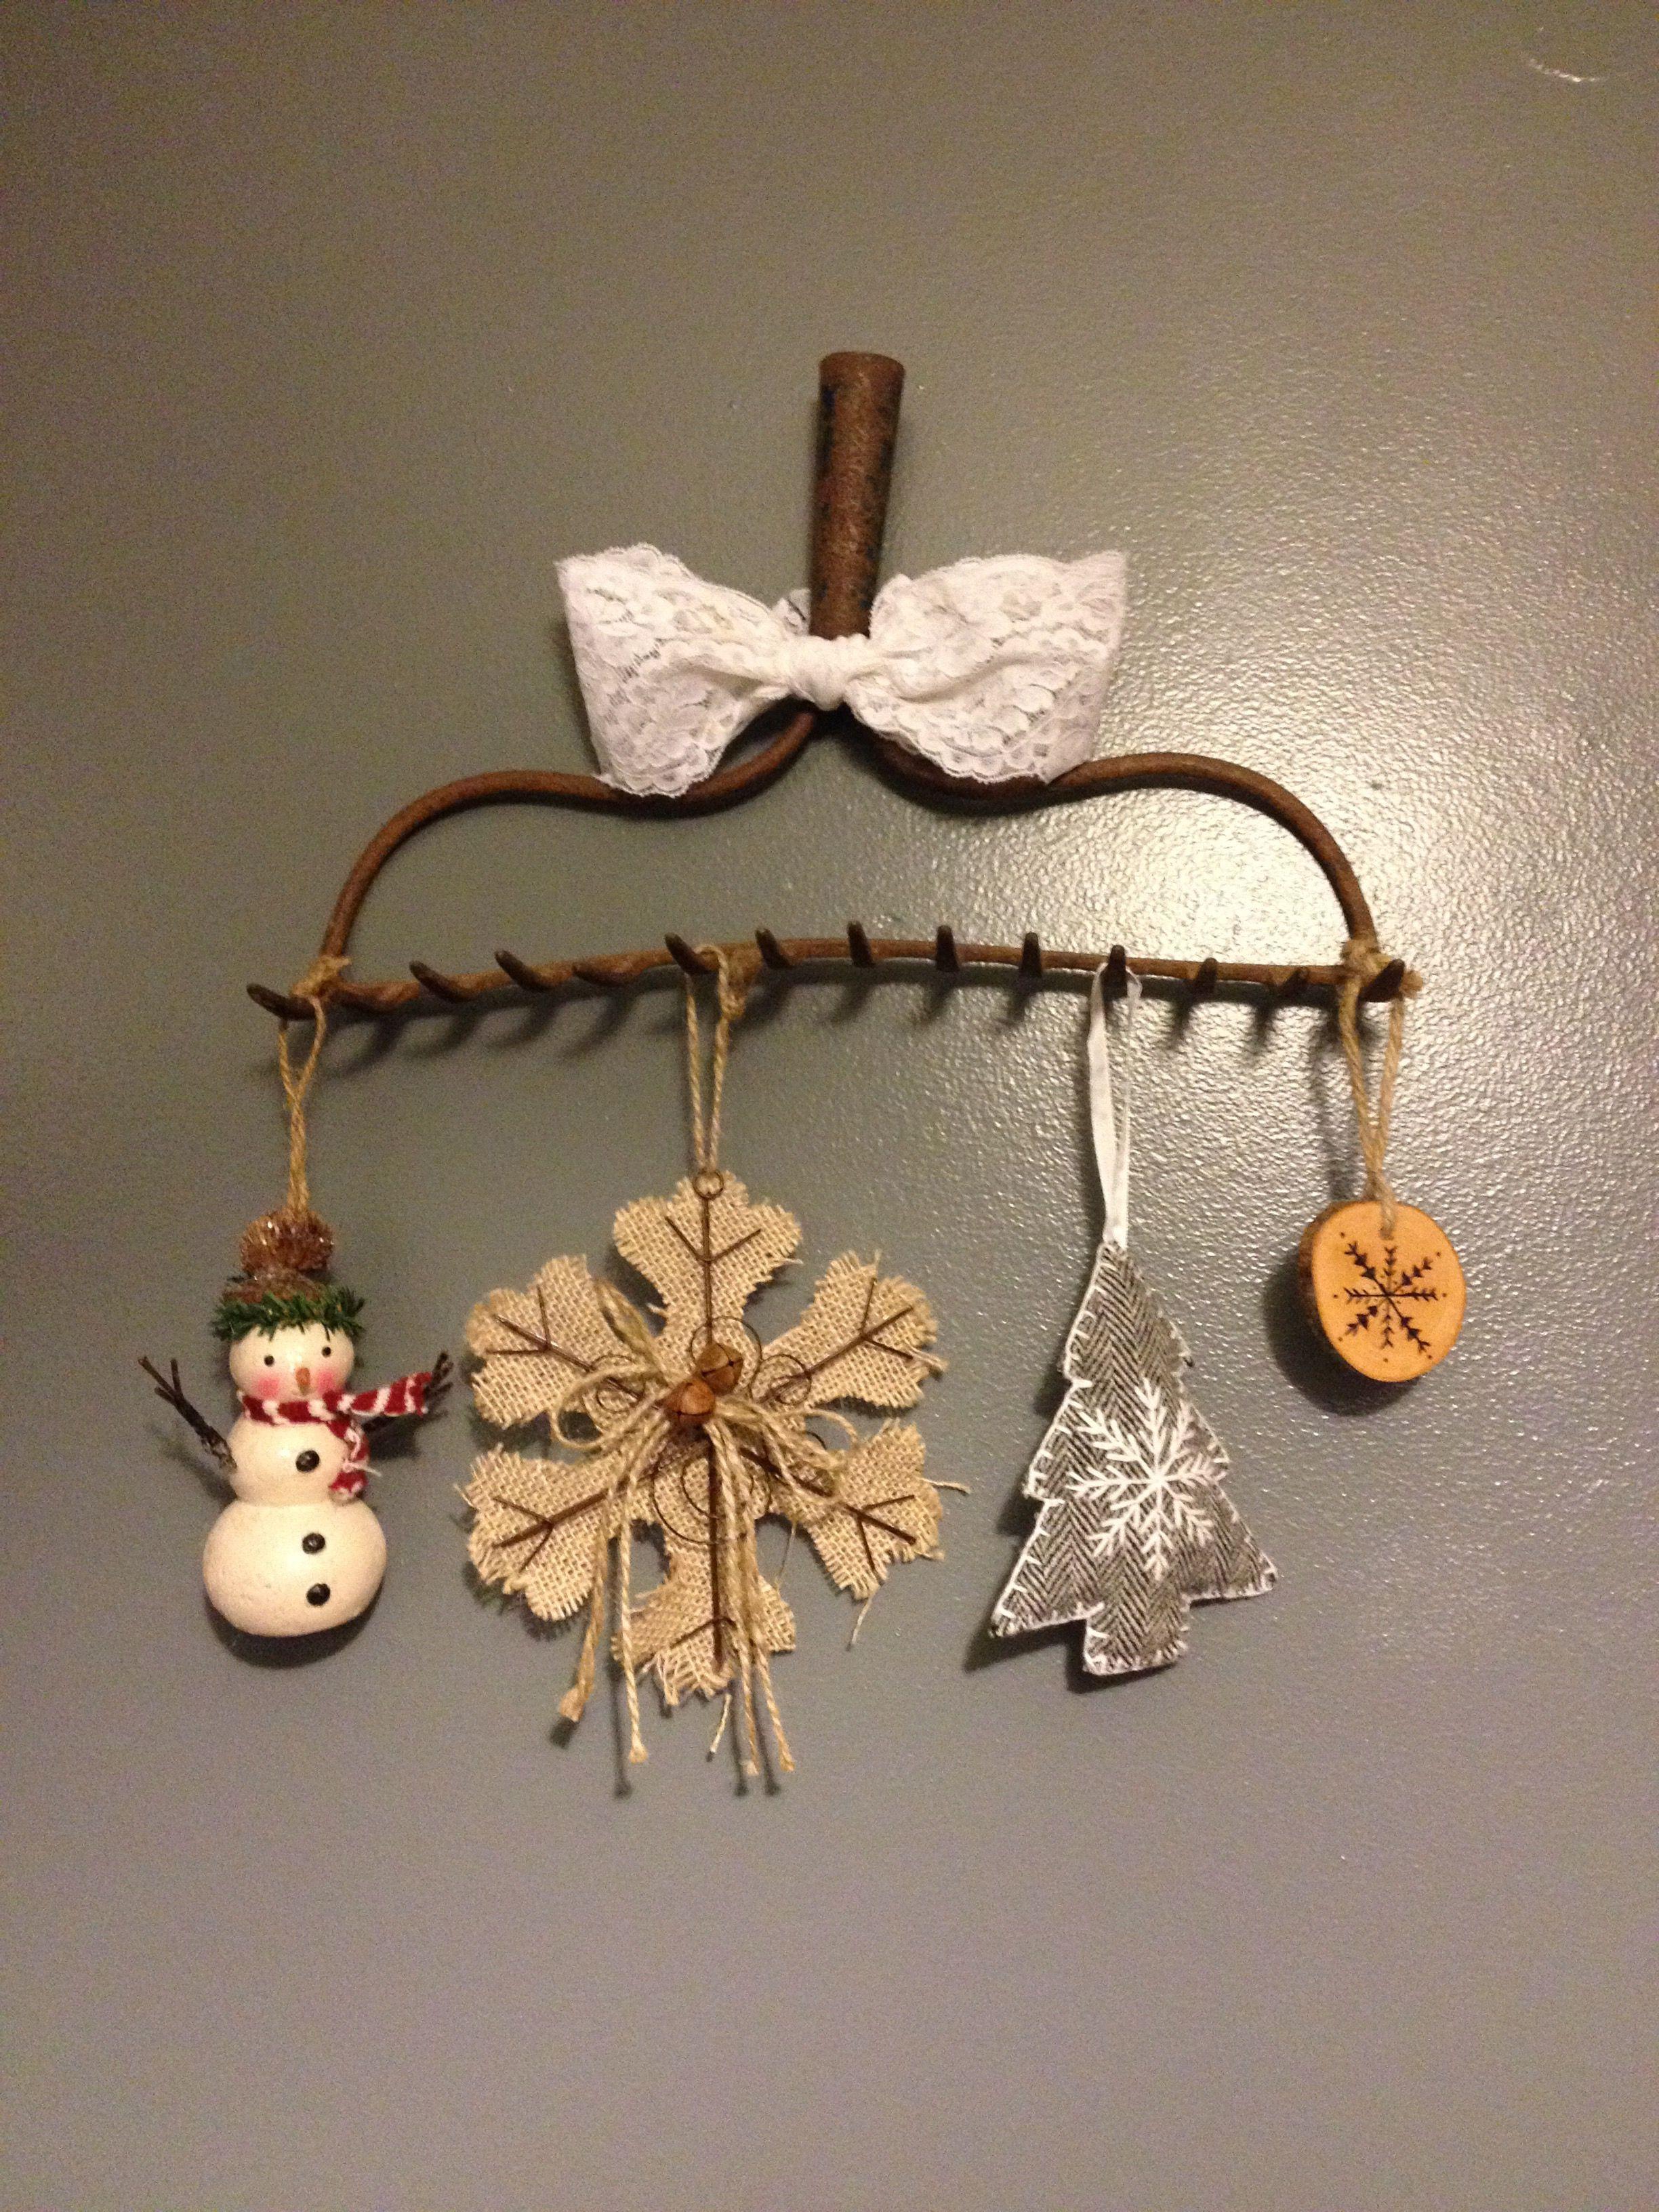 Old rake head & Christmas ornaments Rustic Decor